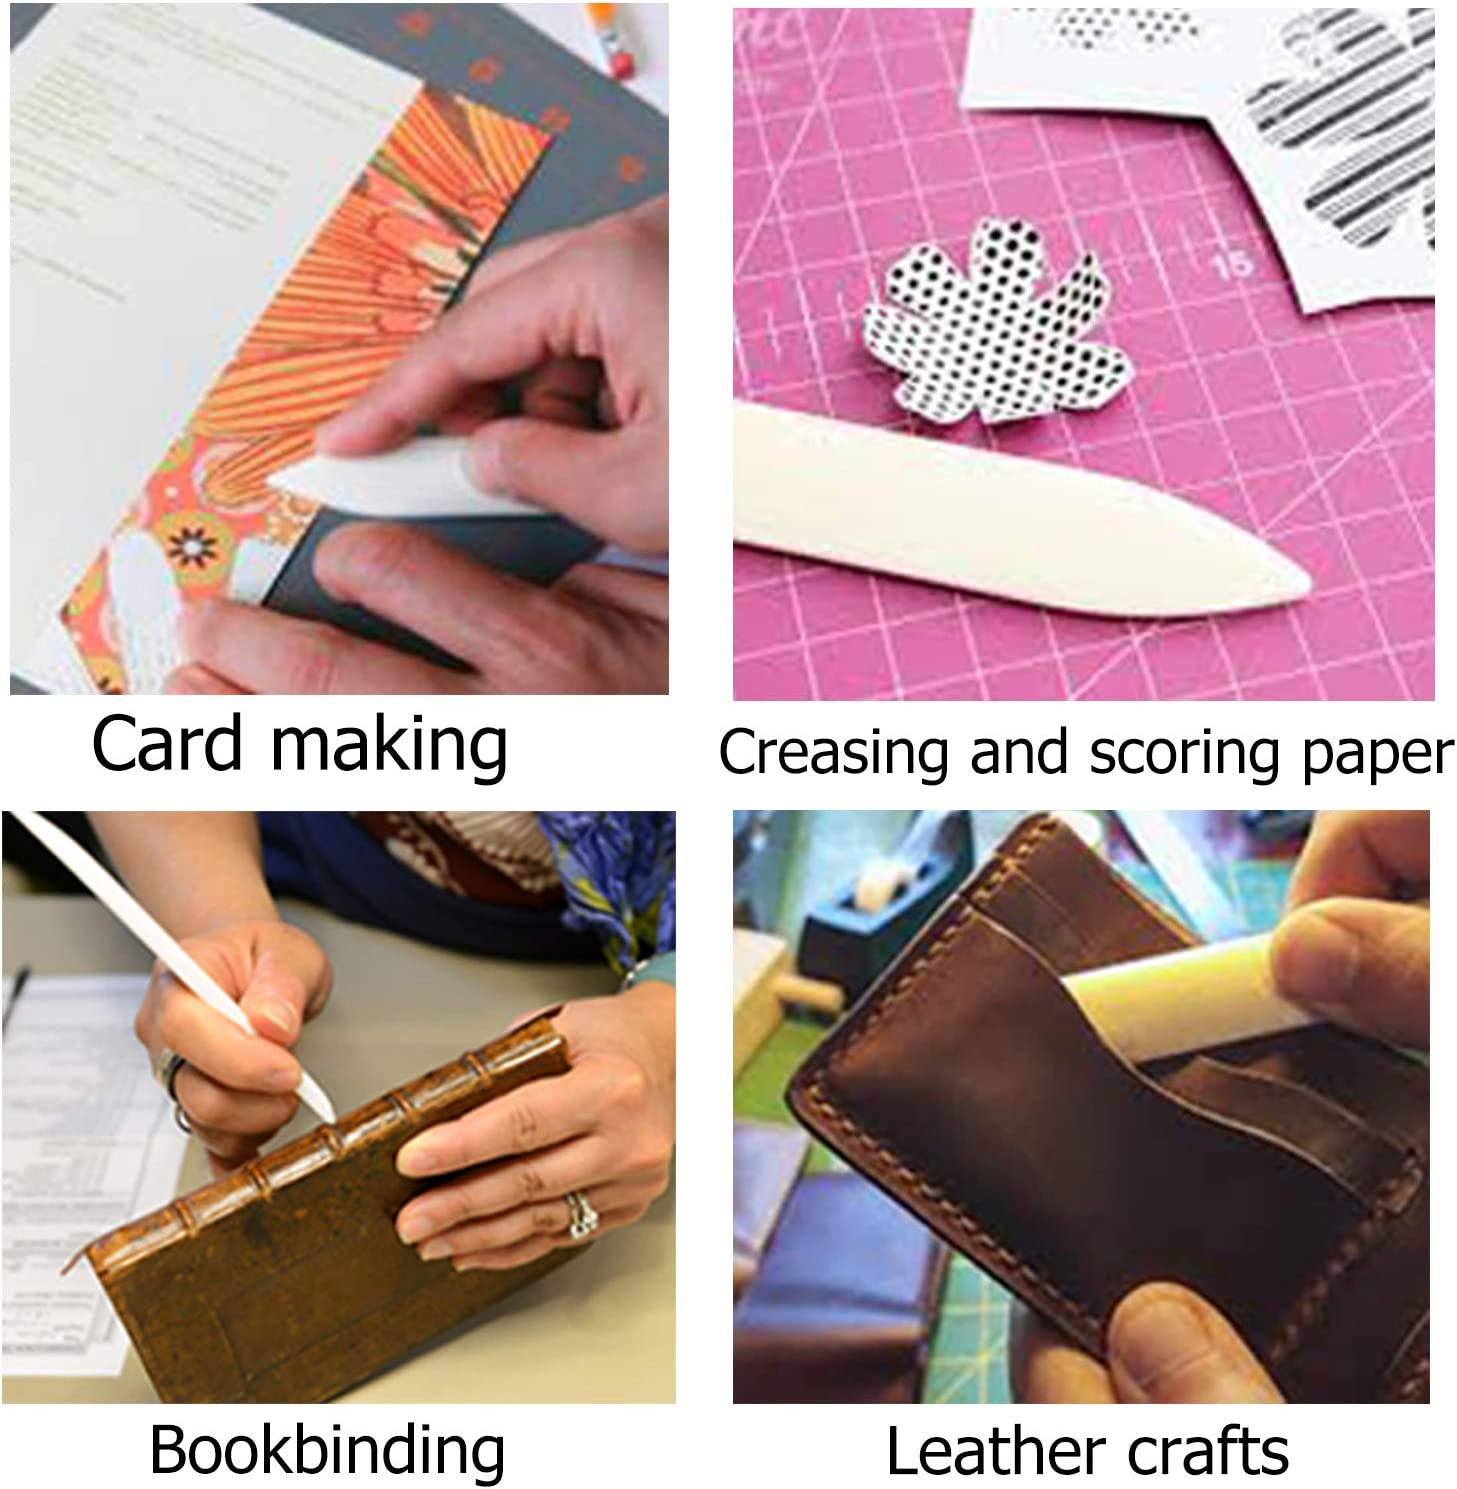 White Folding 100/% Teflon Extra Smooth Origami Bookbinding Premium Quality for Scoring Crafty Gnome Teflon Bone Folder and Scoring Tool Creasing